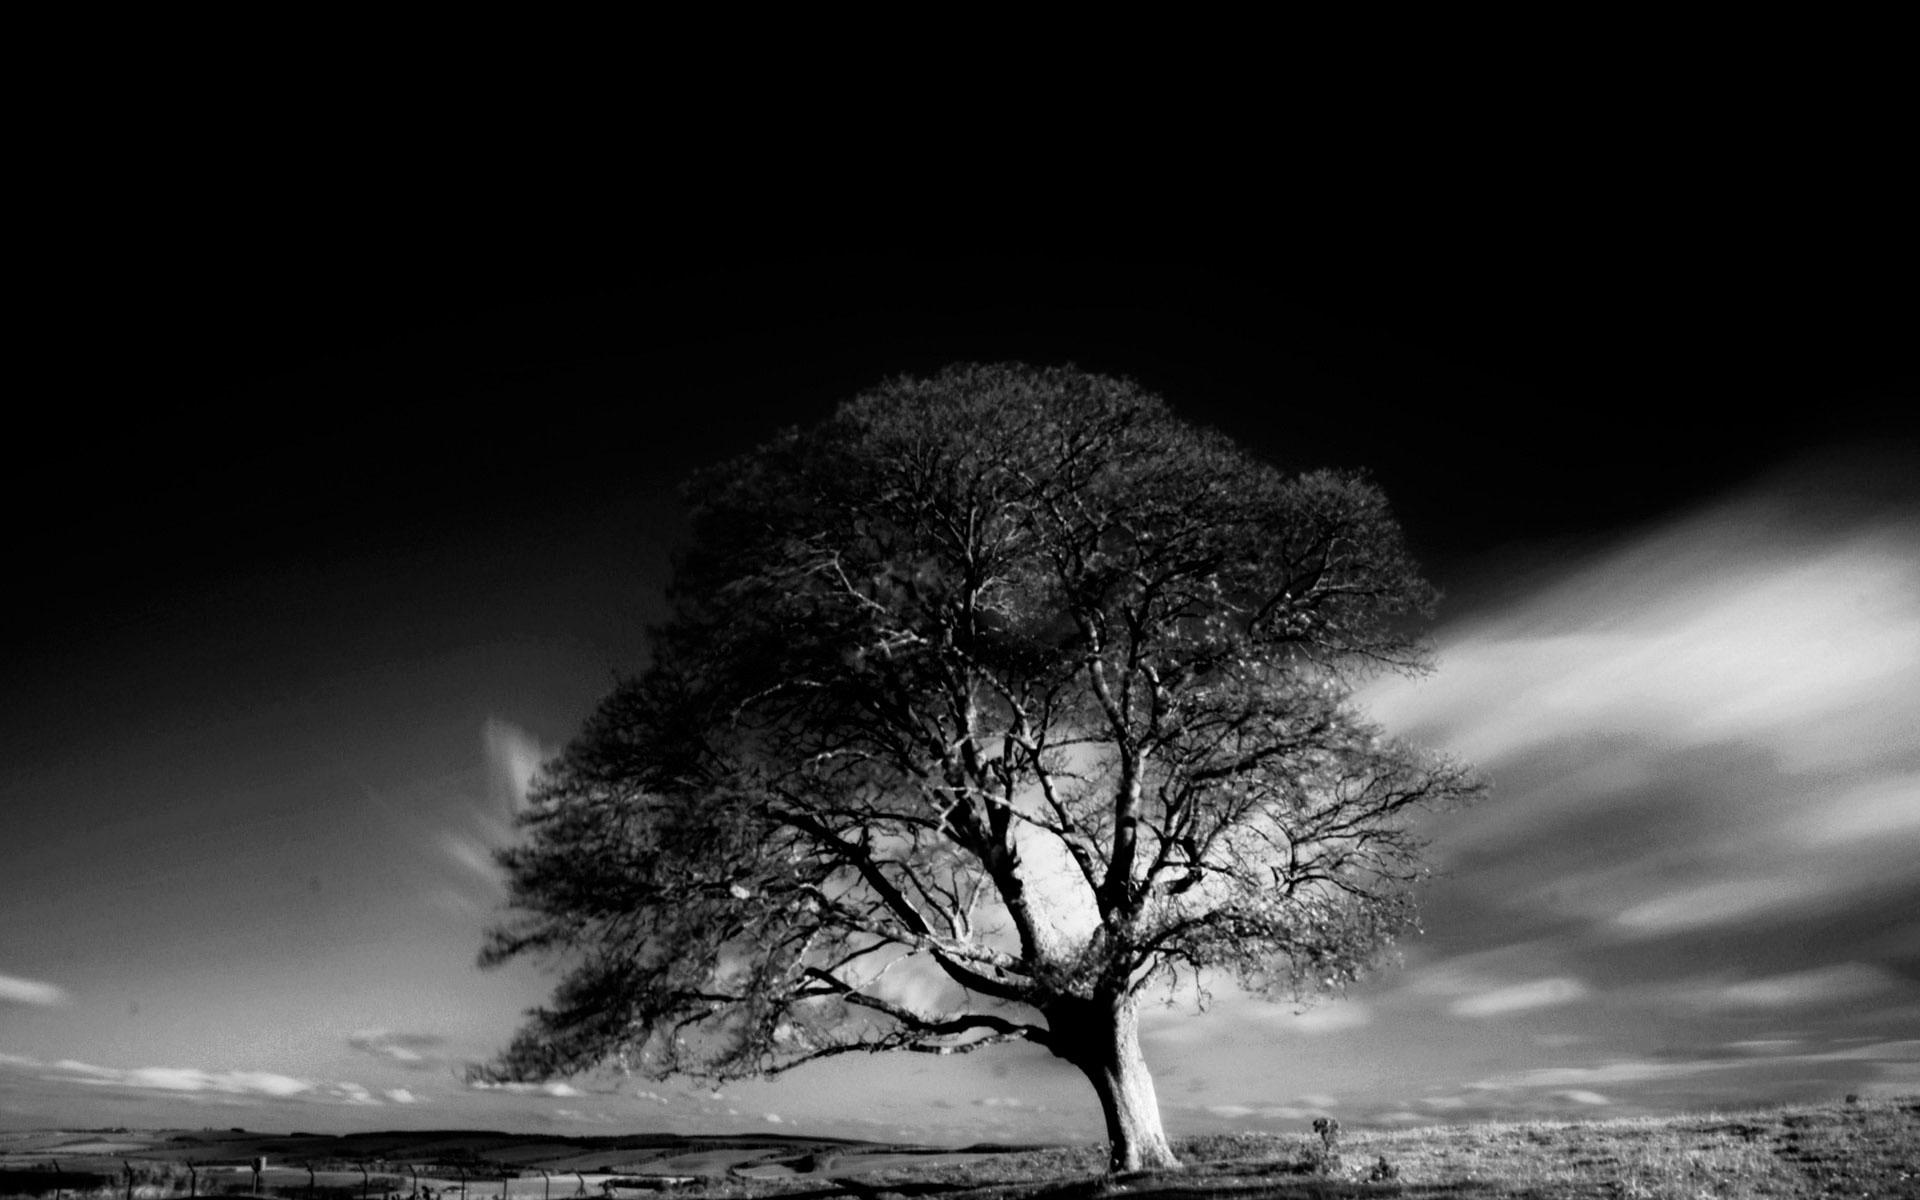 Обои Дерево на ветру, картинки - Обои на рабочий стол ...